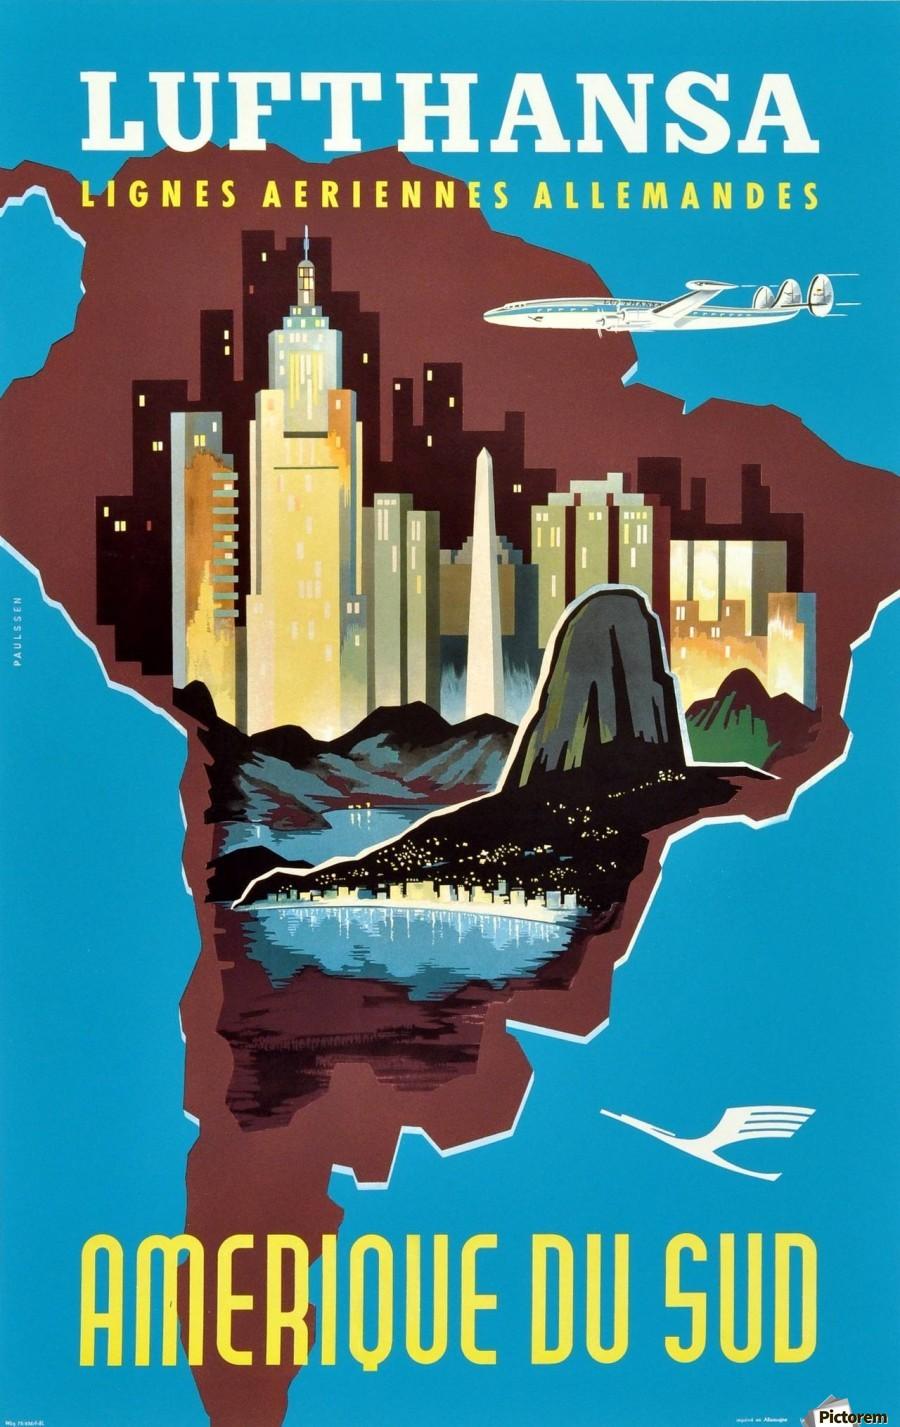 Original Vintage Travel Poster Advertising South America ...